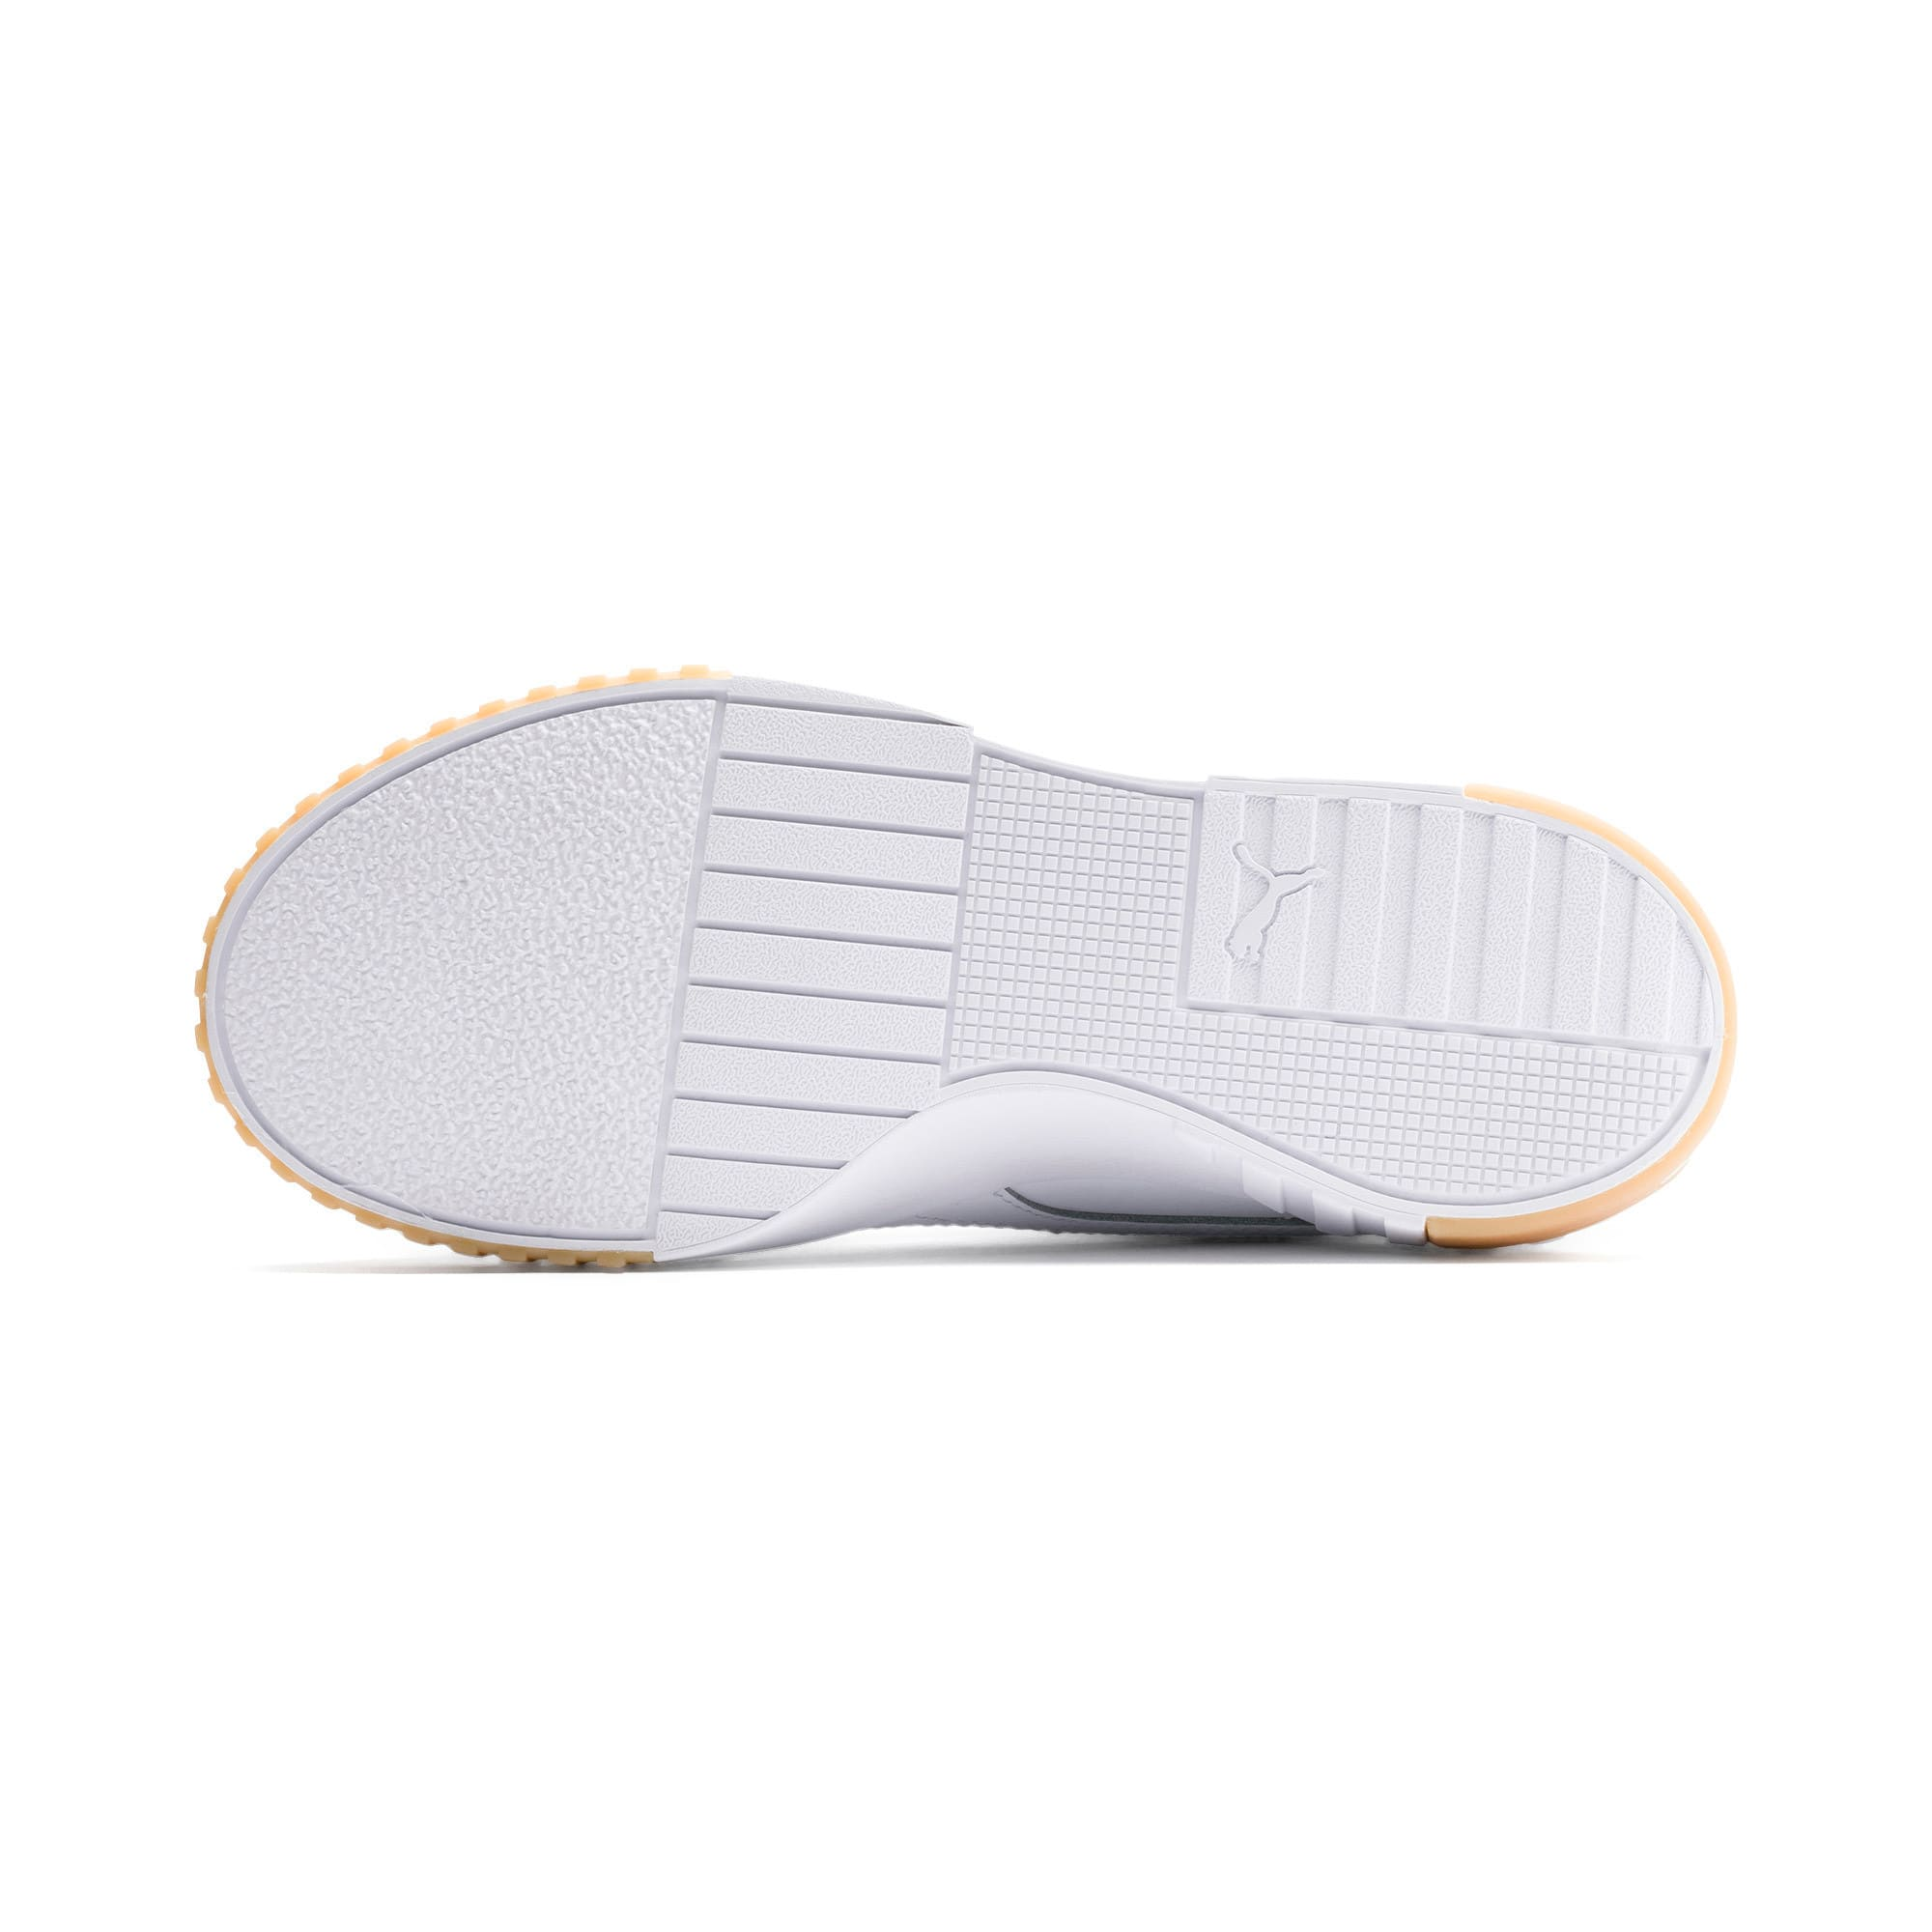 Thumbnail 4 of Cali Exotic Damen Sneaker, Puma White-Puma White, medium